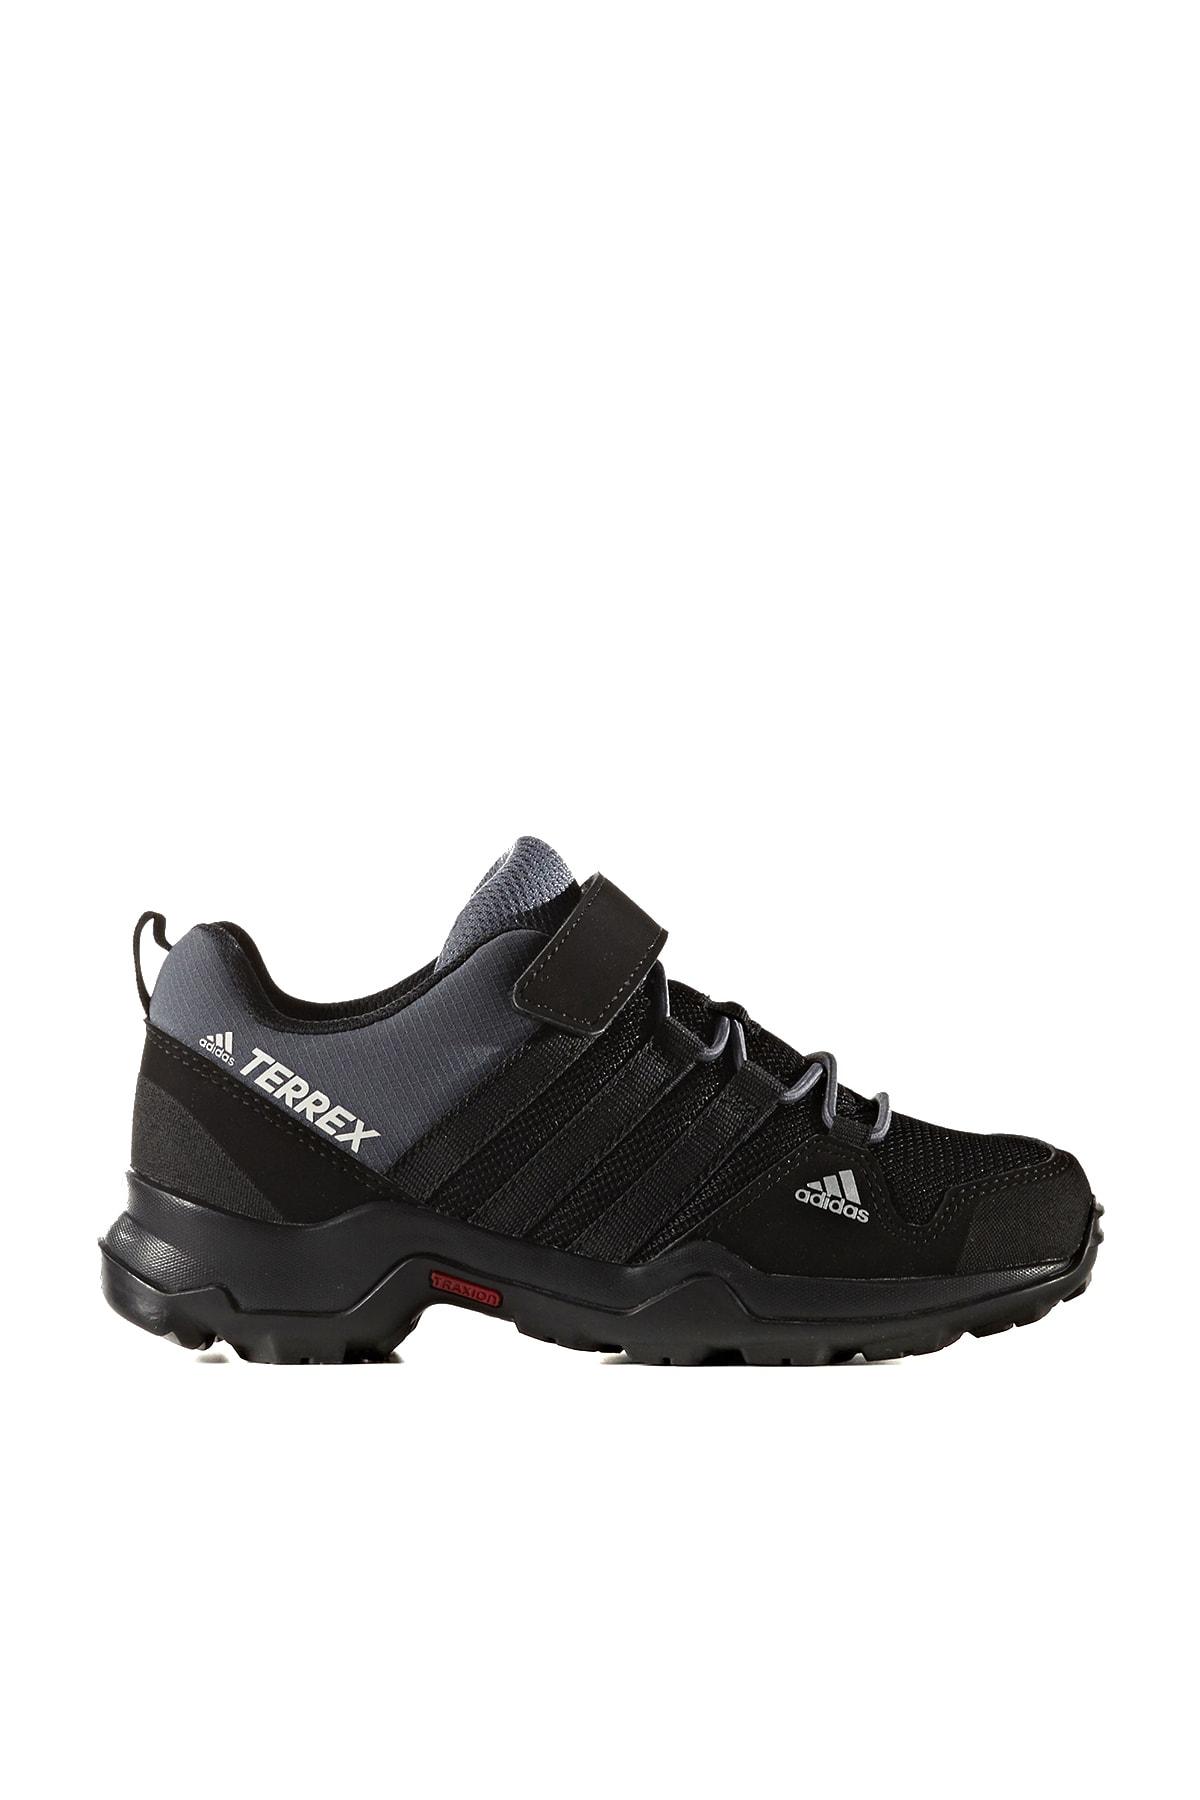 adidas Çocuk Terrex Ax2R Cf K Outdoor Ayakkabı 1